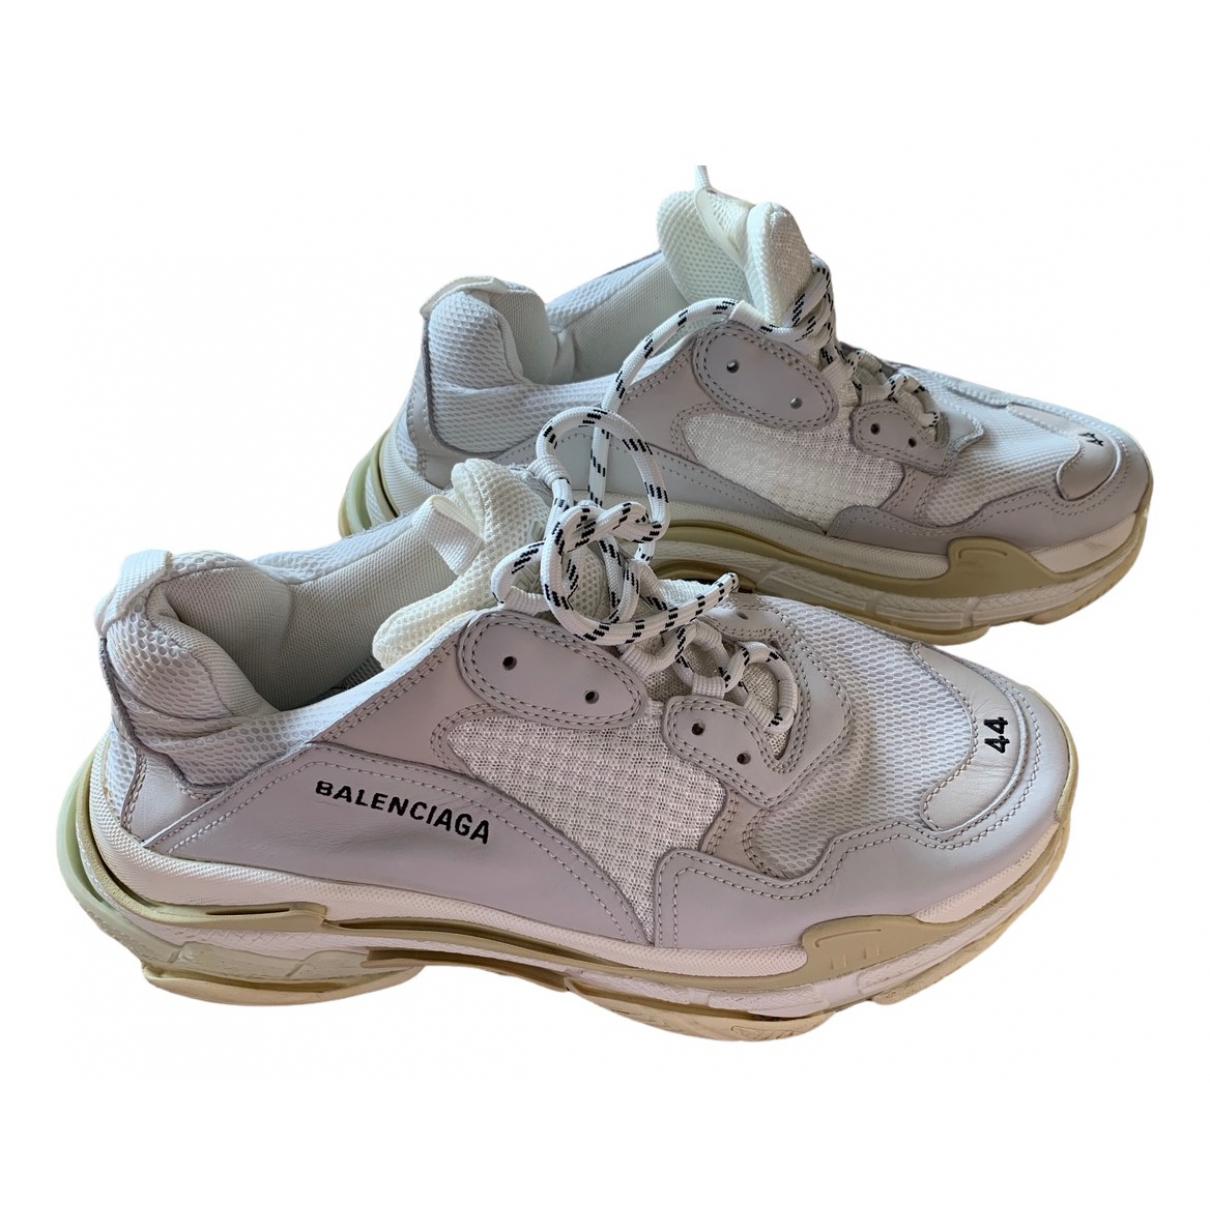 Balenciaga - Baskets Triple S pour homme - blanc